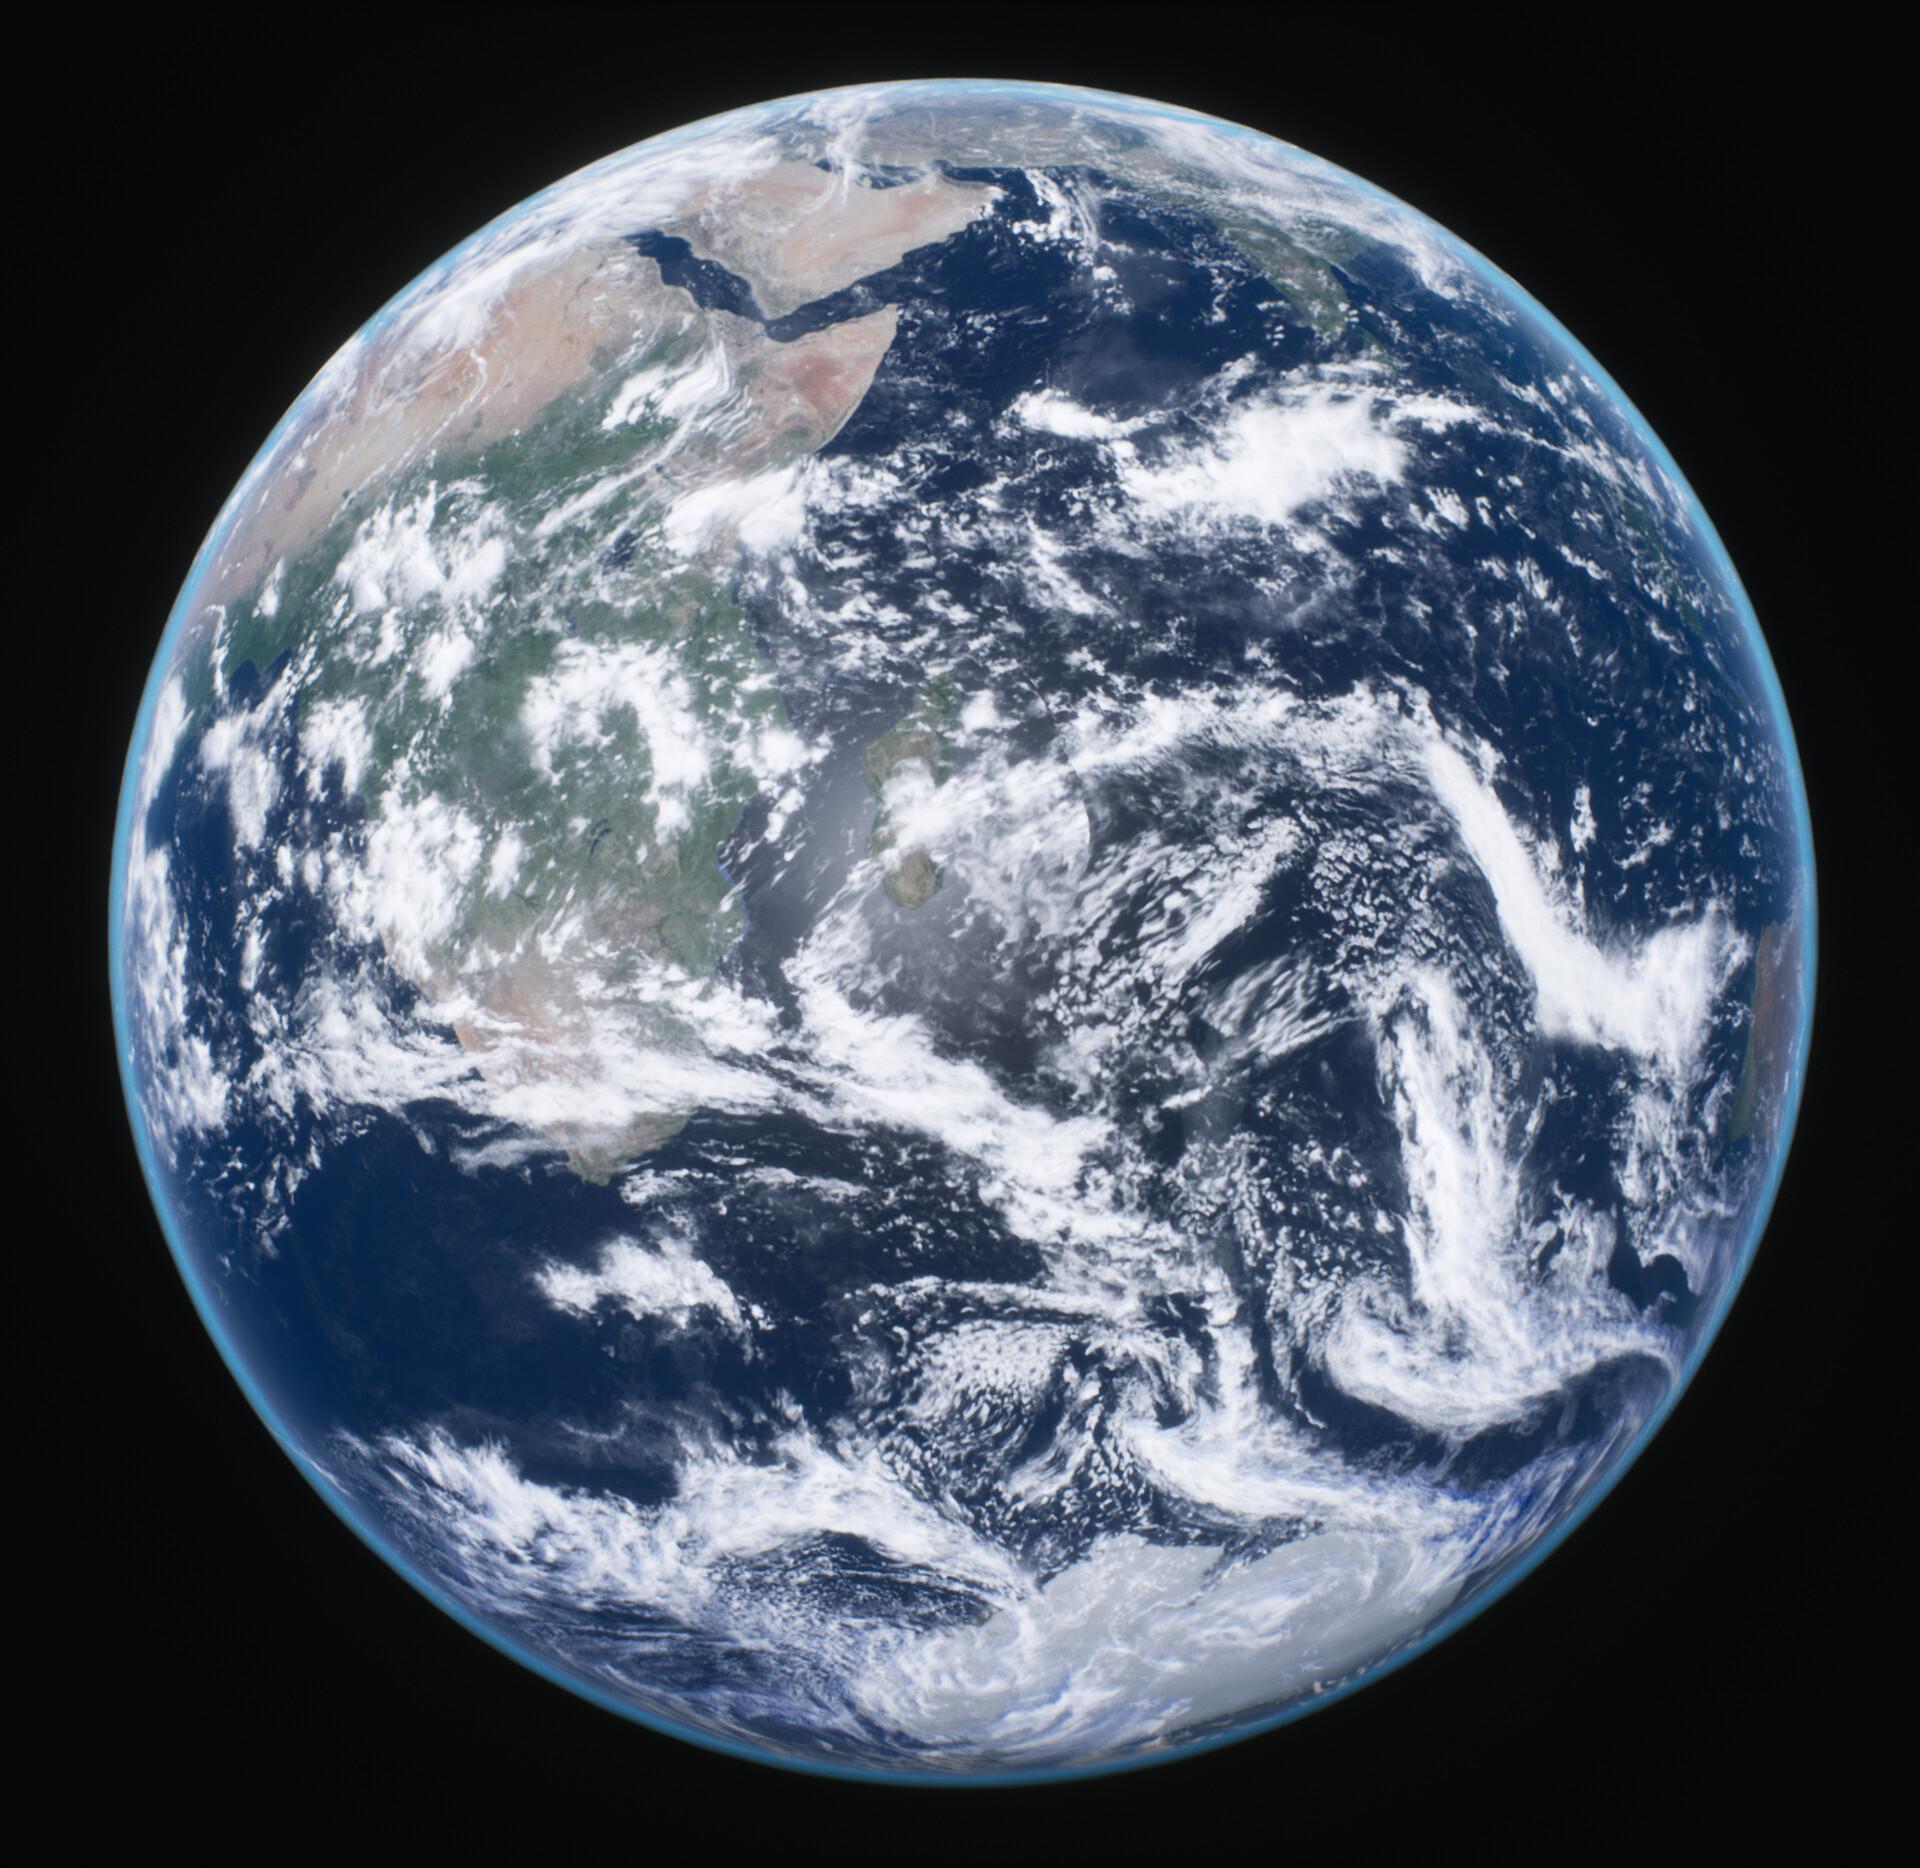 The Blue Marble. Original photo - https://images.nasa.gov/details-as17-148-22727.html